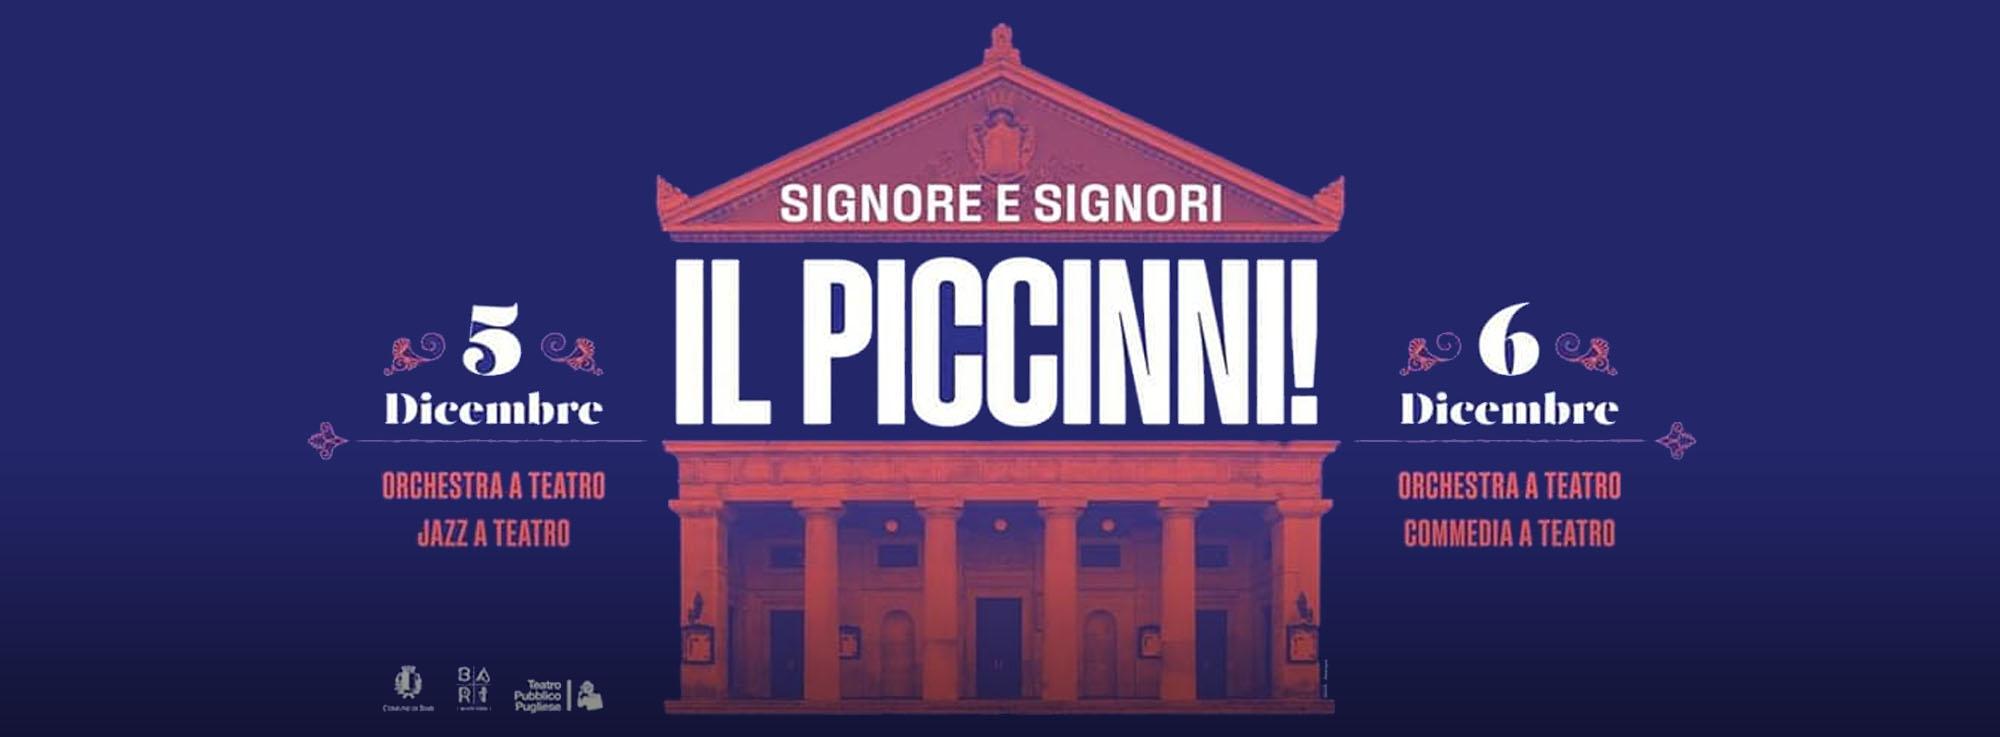 Bari: Riapertura Teatro Piccinni